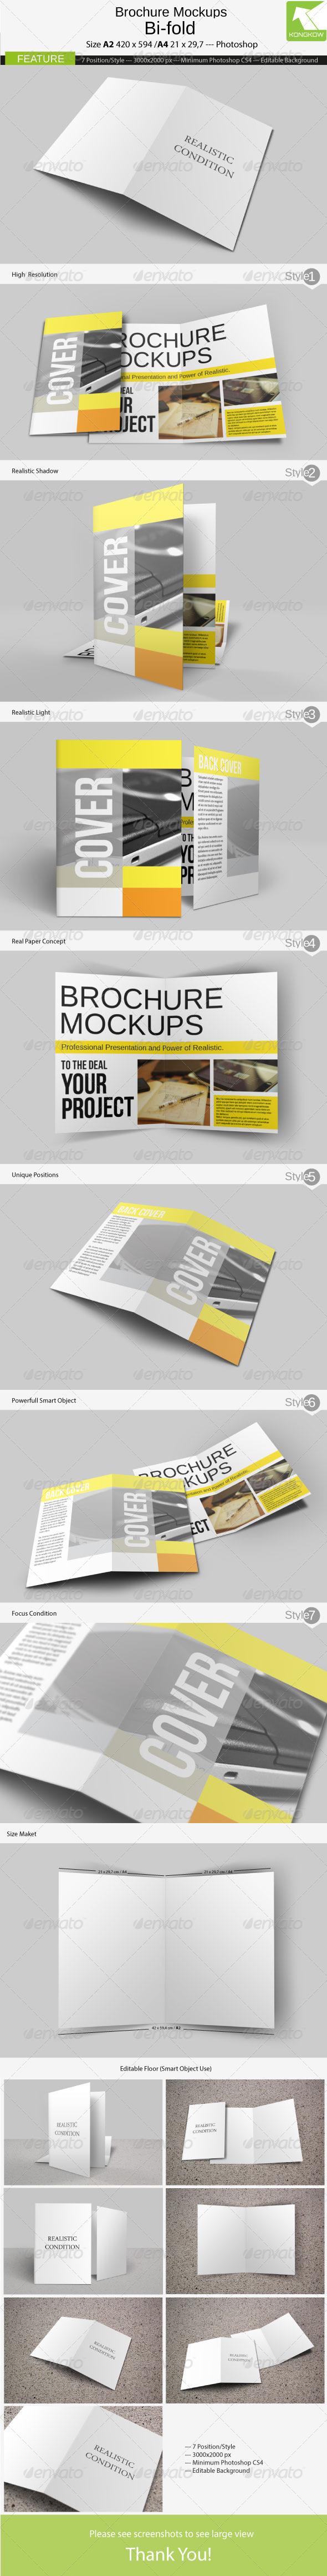 GraphicRiver Brochure Mockups Bi-fold A2 4142881